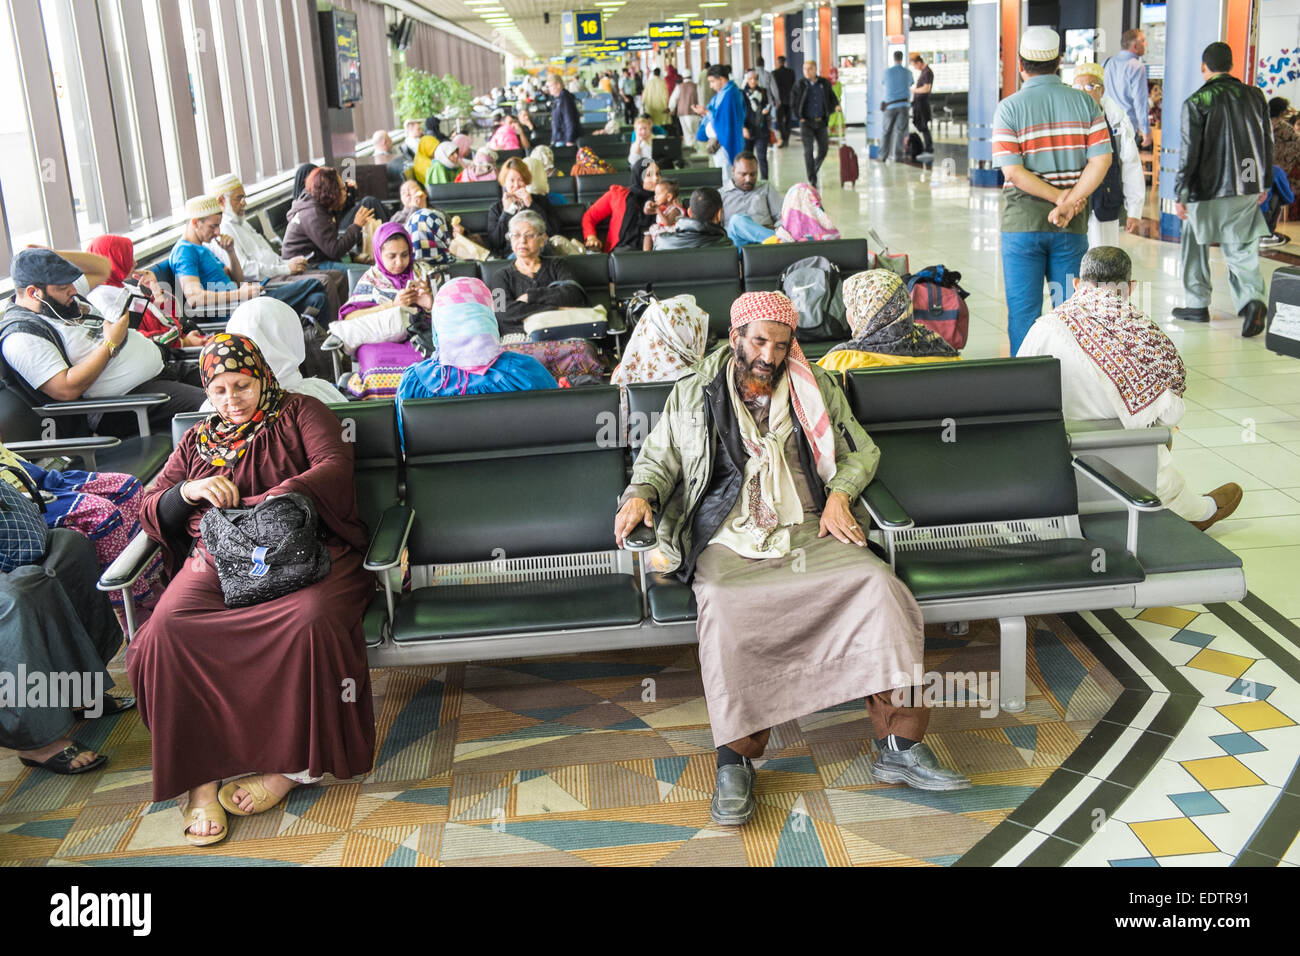 Bahrain International Airport, Bahrain, Middle East - Stock Image